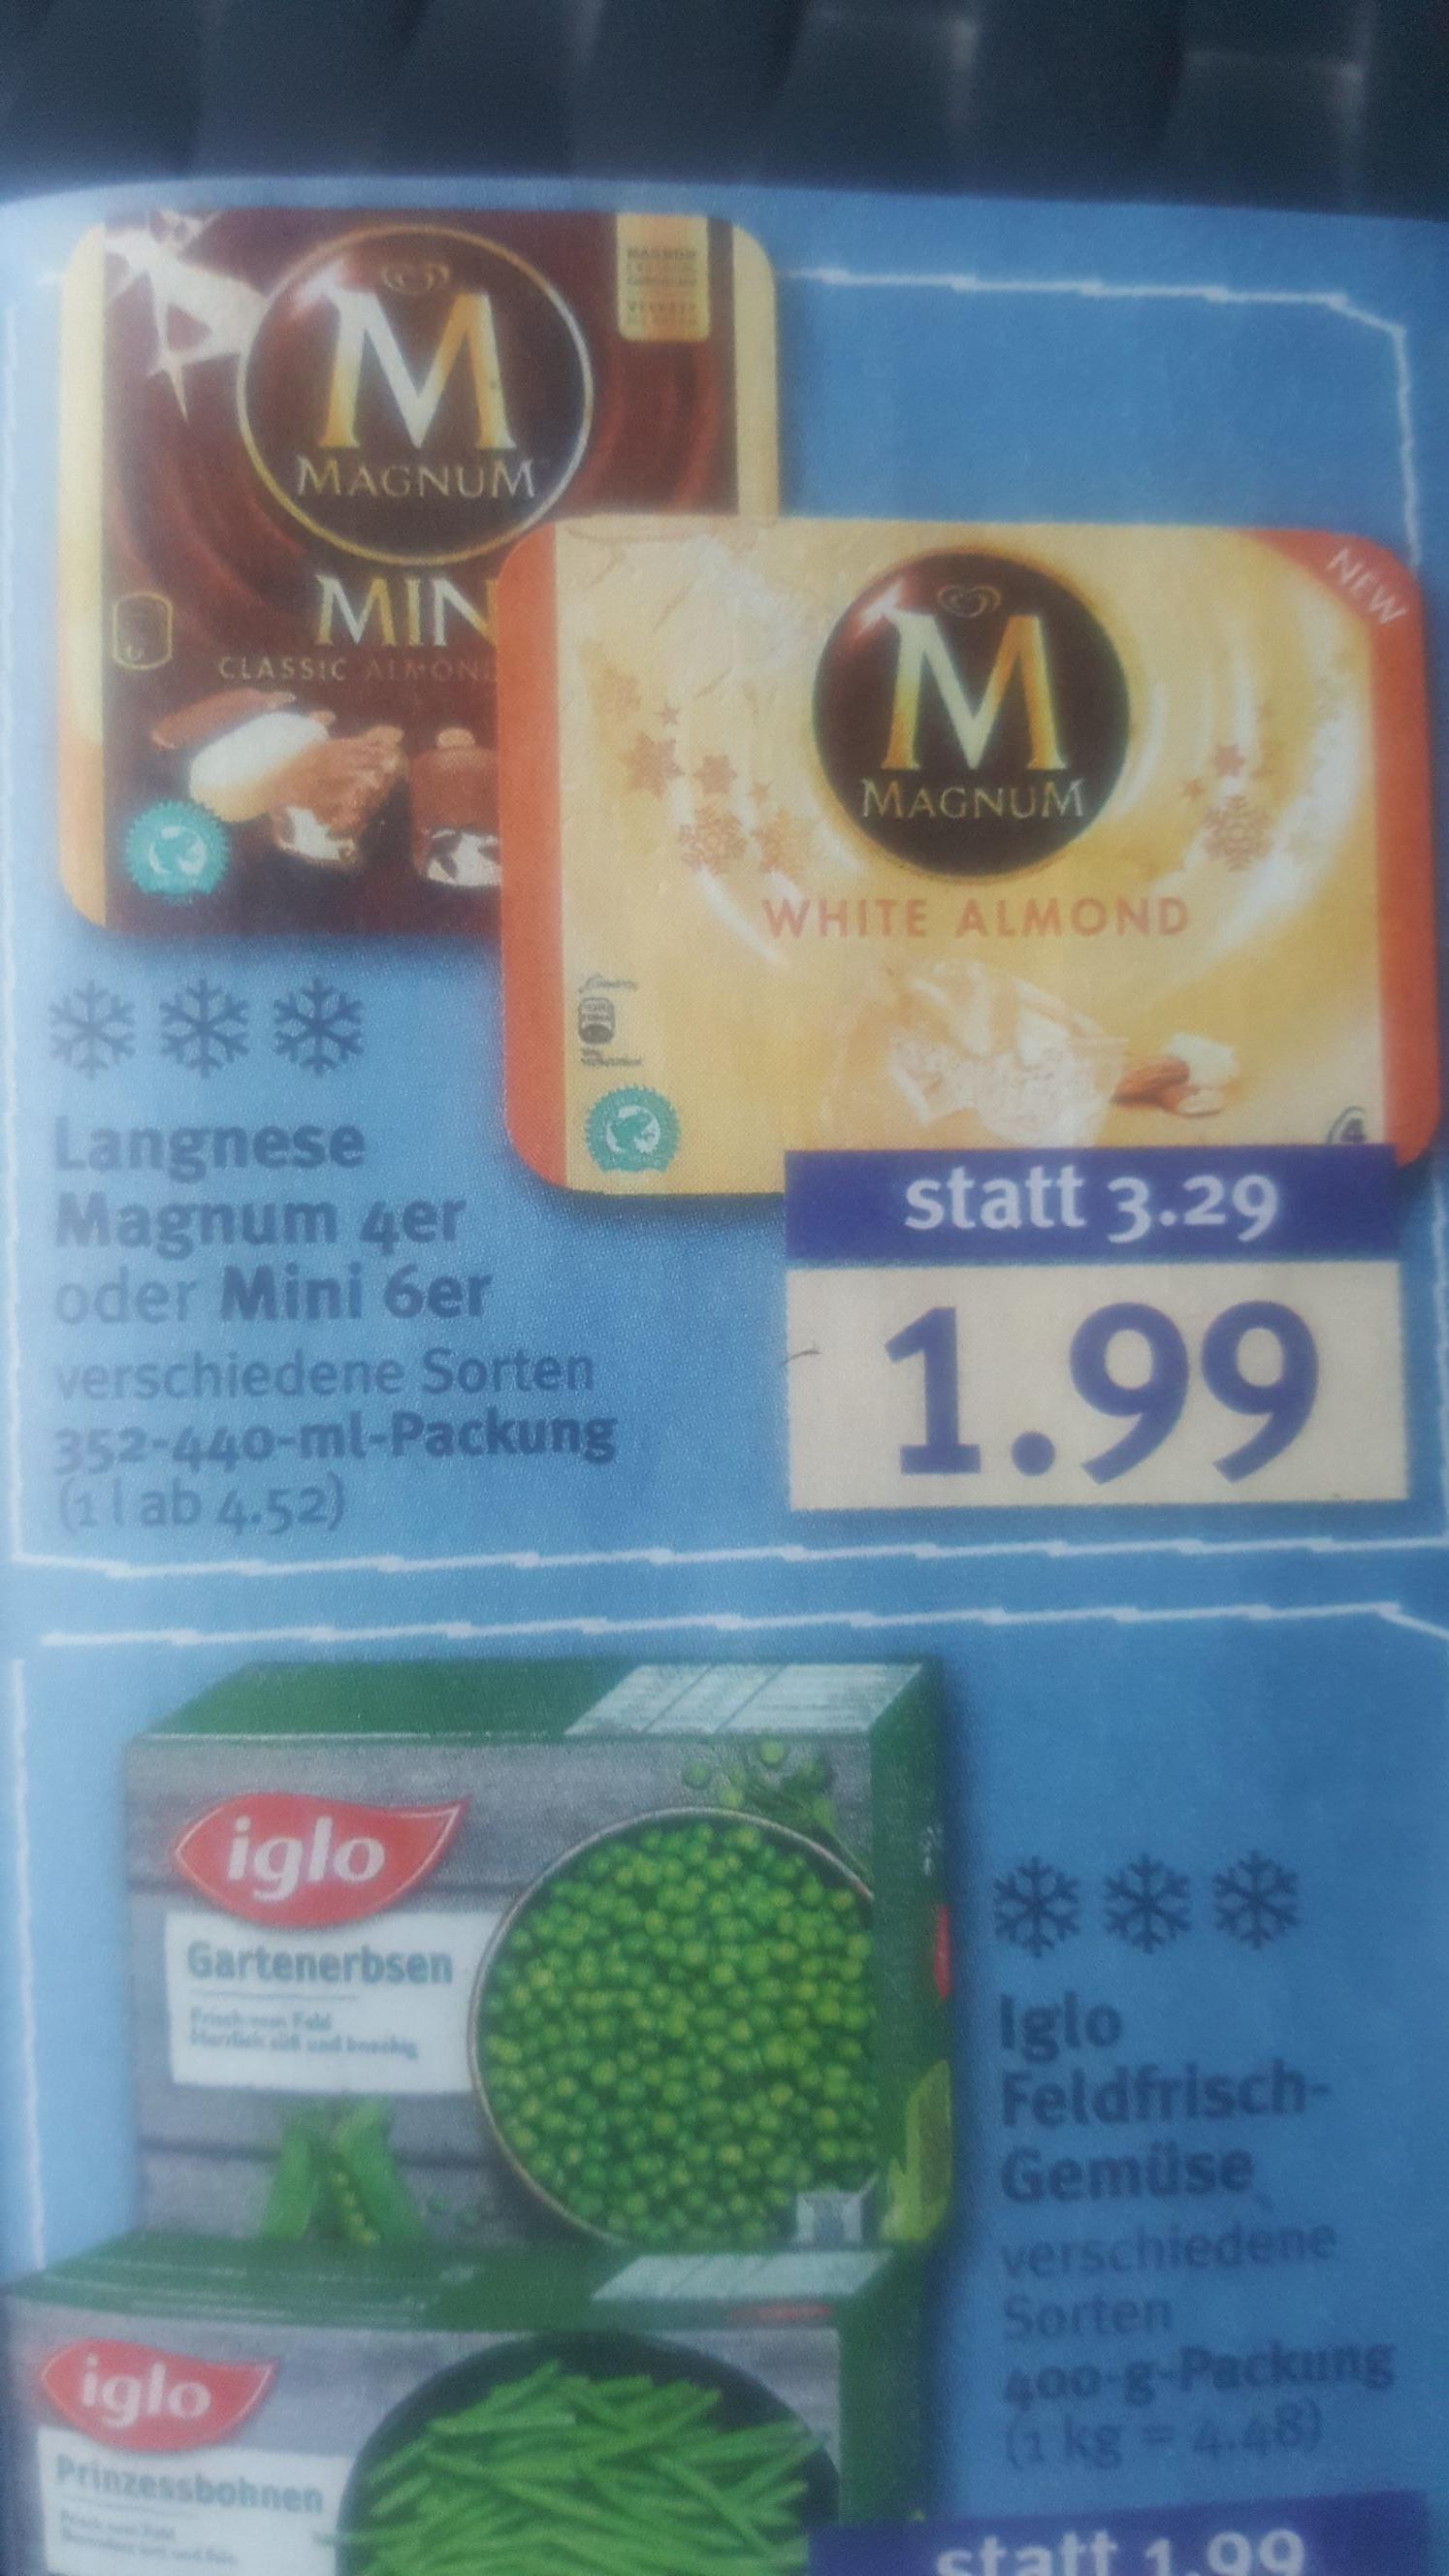 ( combi ) Magnum 4er oder Magnum Mini 6er